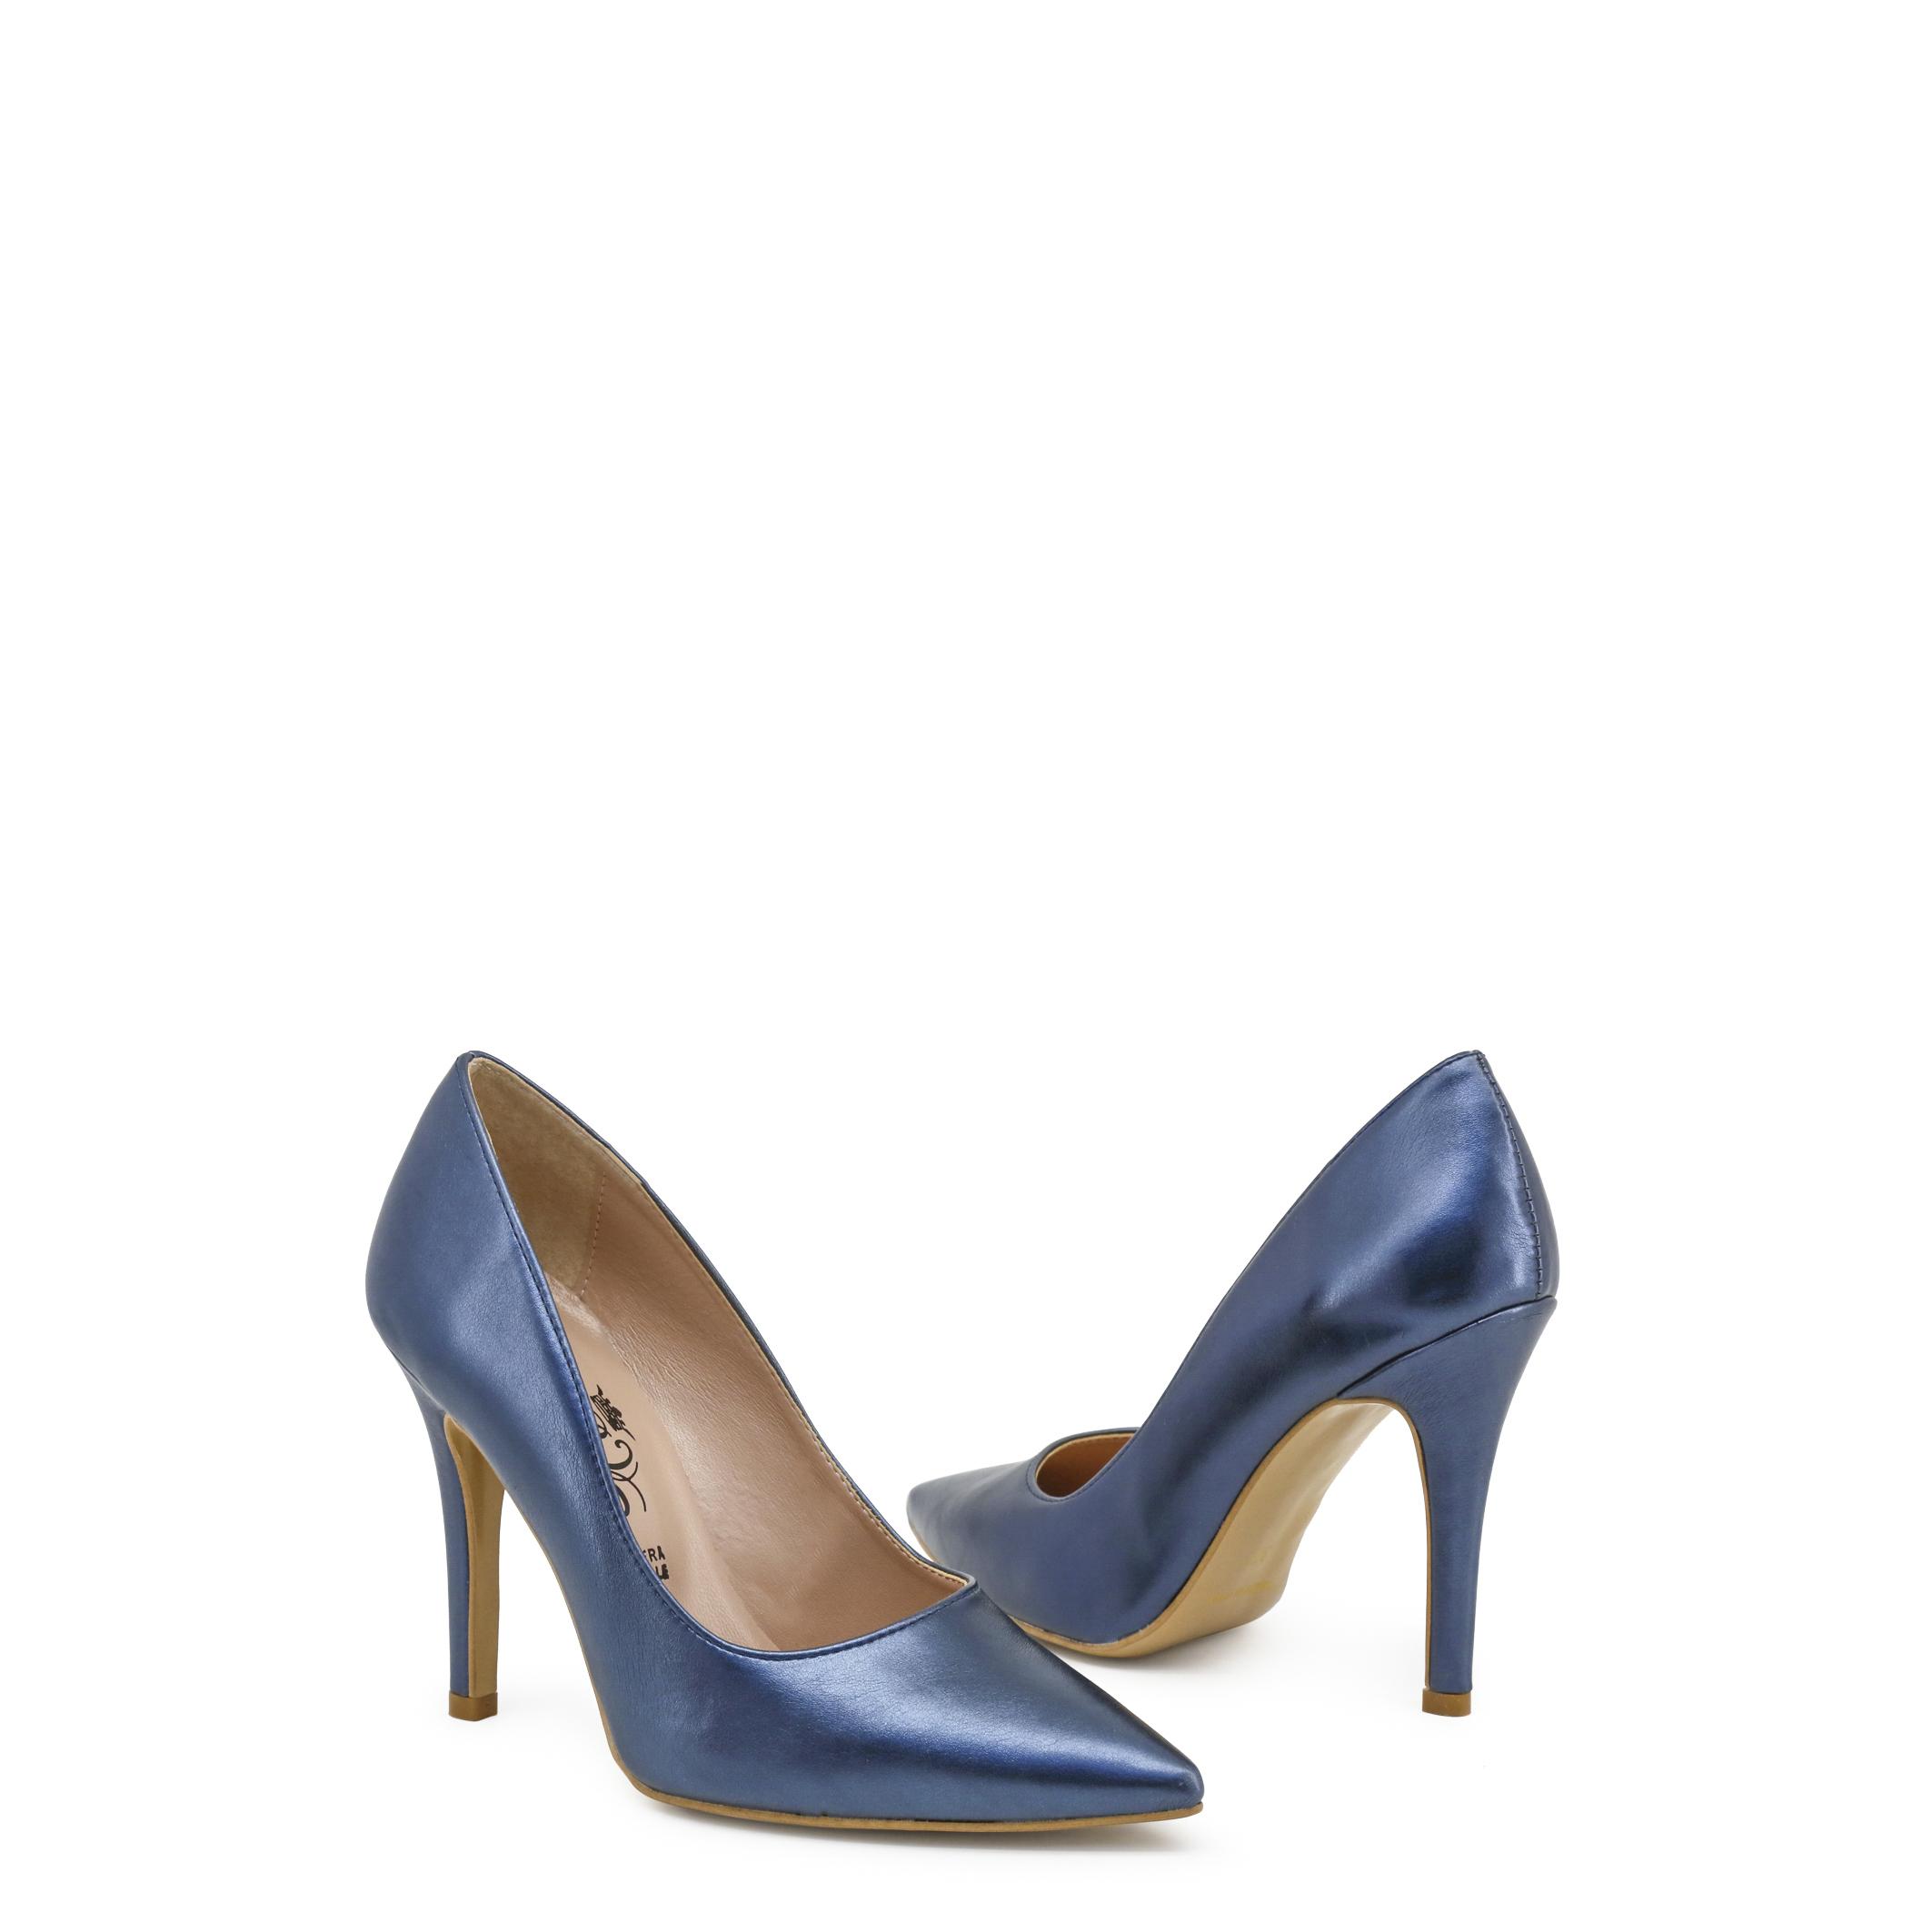 Paris Damen Hilton Schuhe 2760, Damen Paris High Heels Gelb/Blau Frühling/Sommer pumps hochz 8174c4